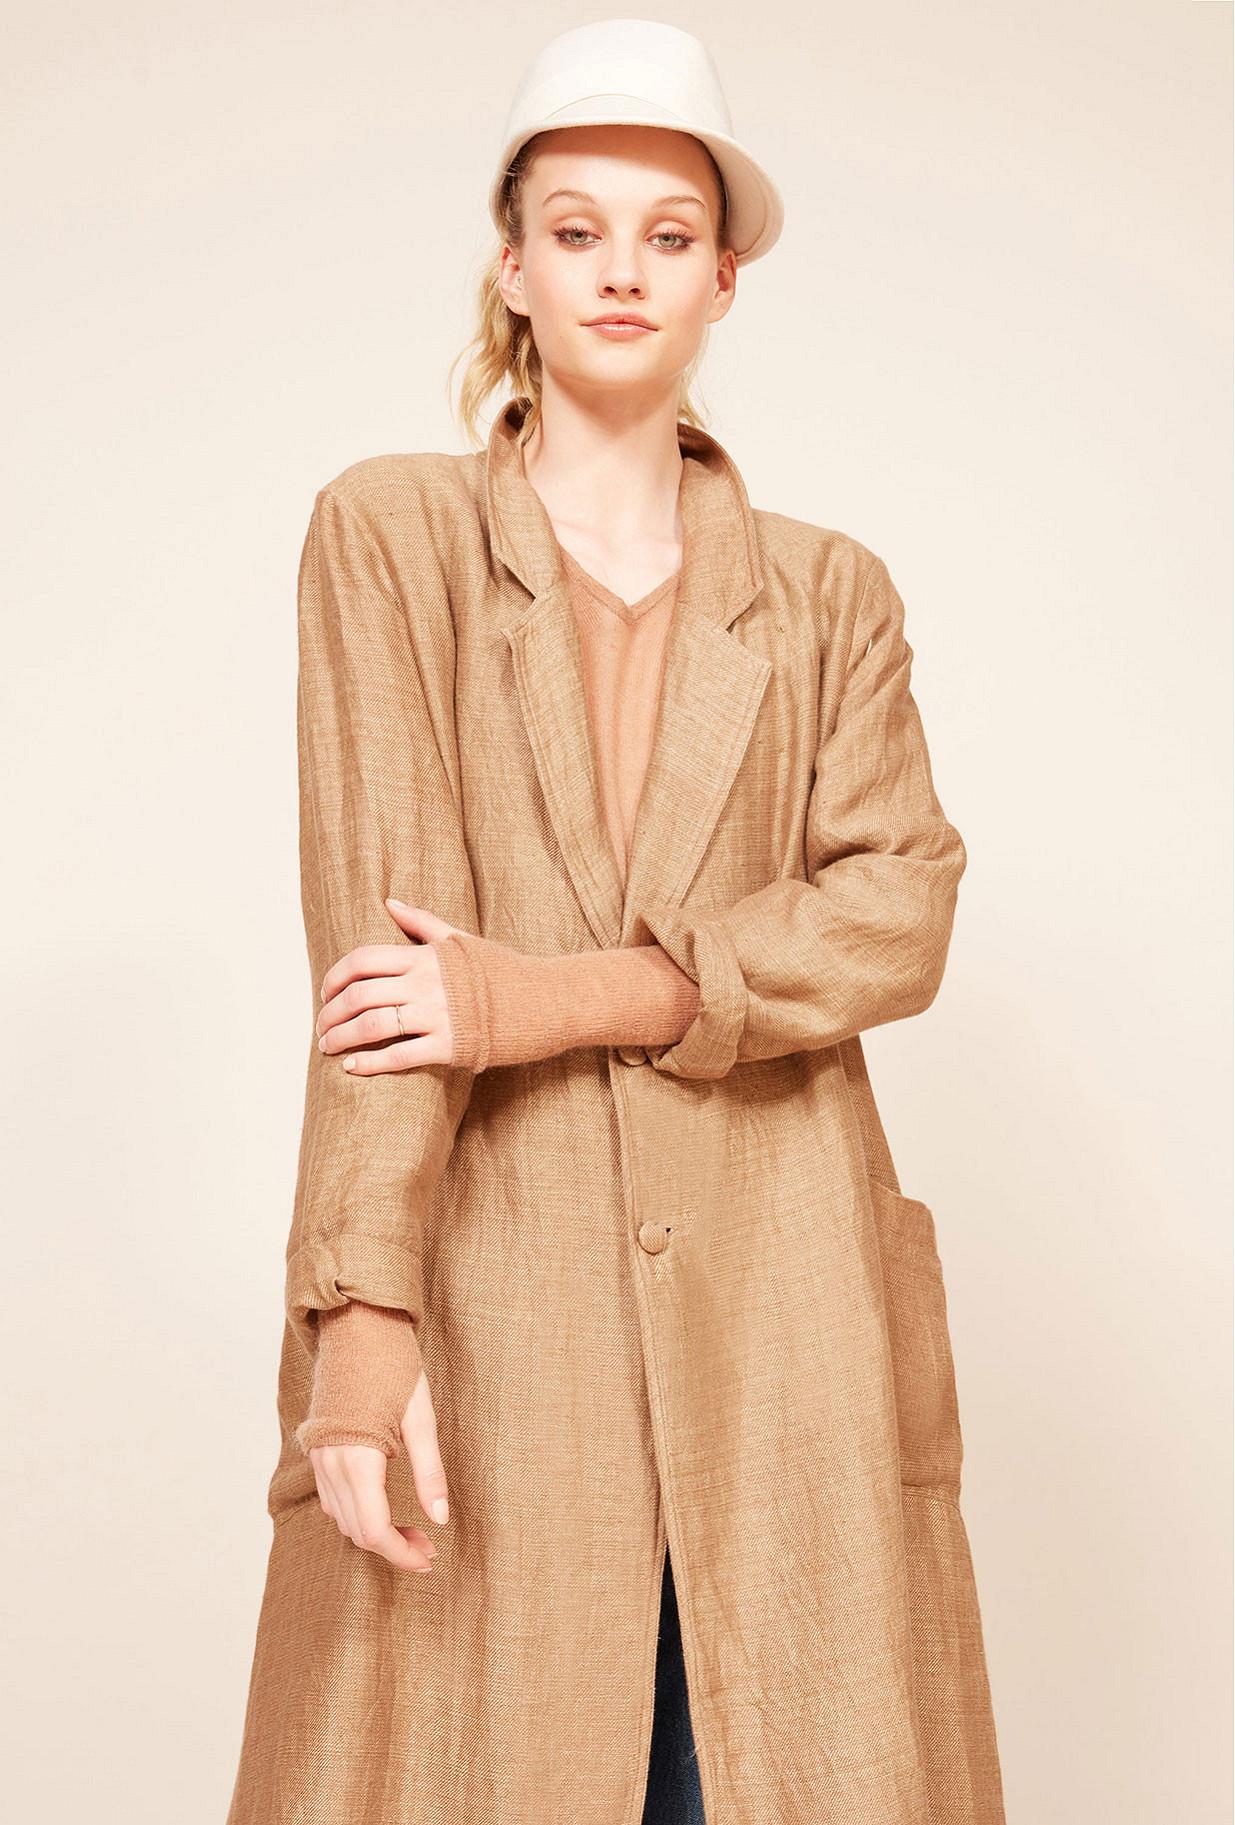 Paris clothes store Coat  Sahara french designer fashion Paris